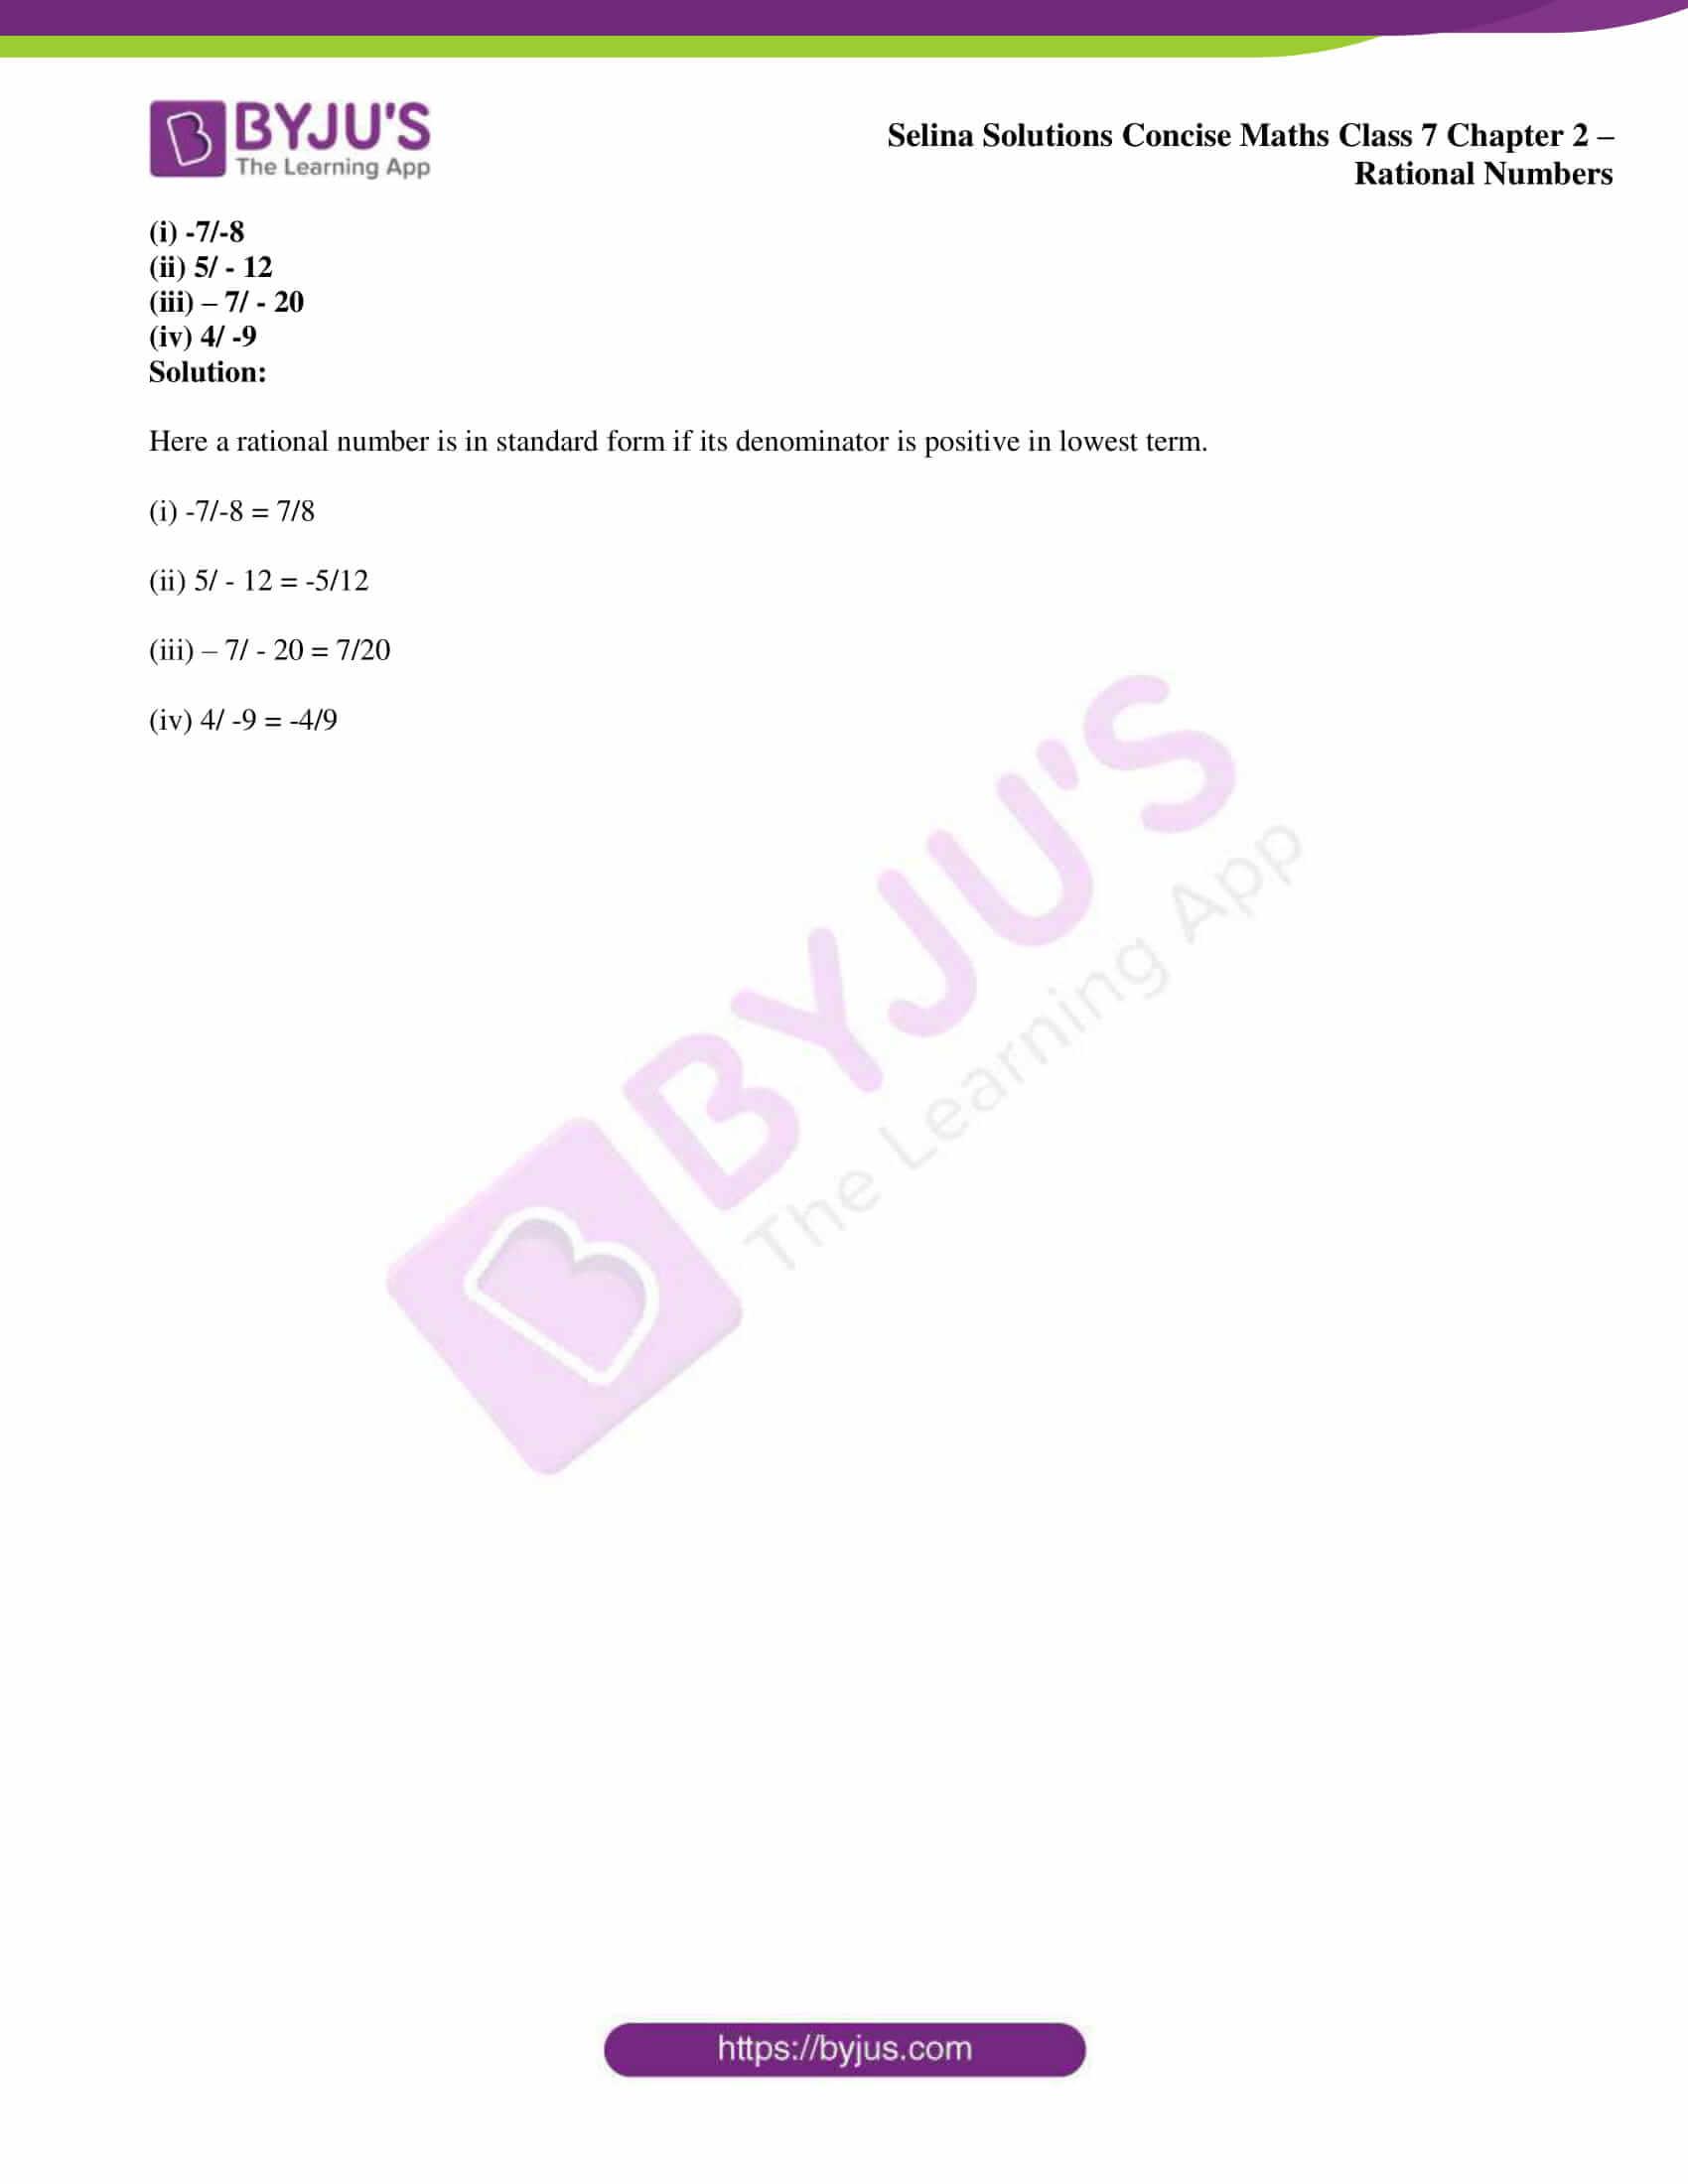 selina sol concise maths class 7 ch2 ex 2a 8